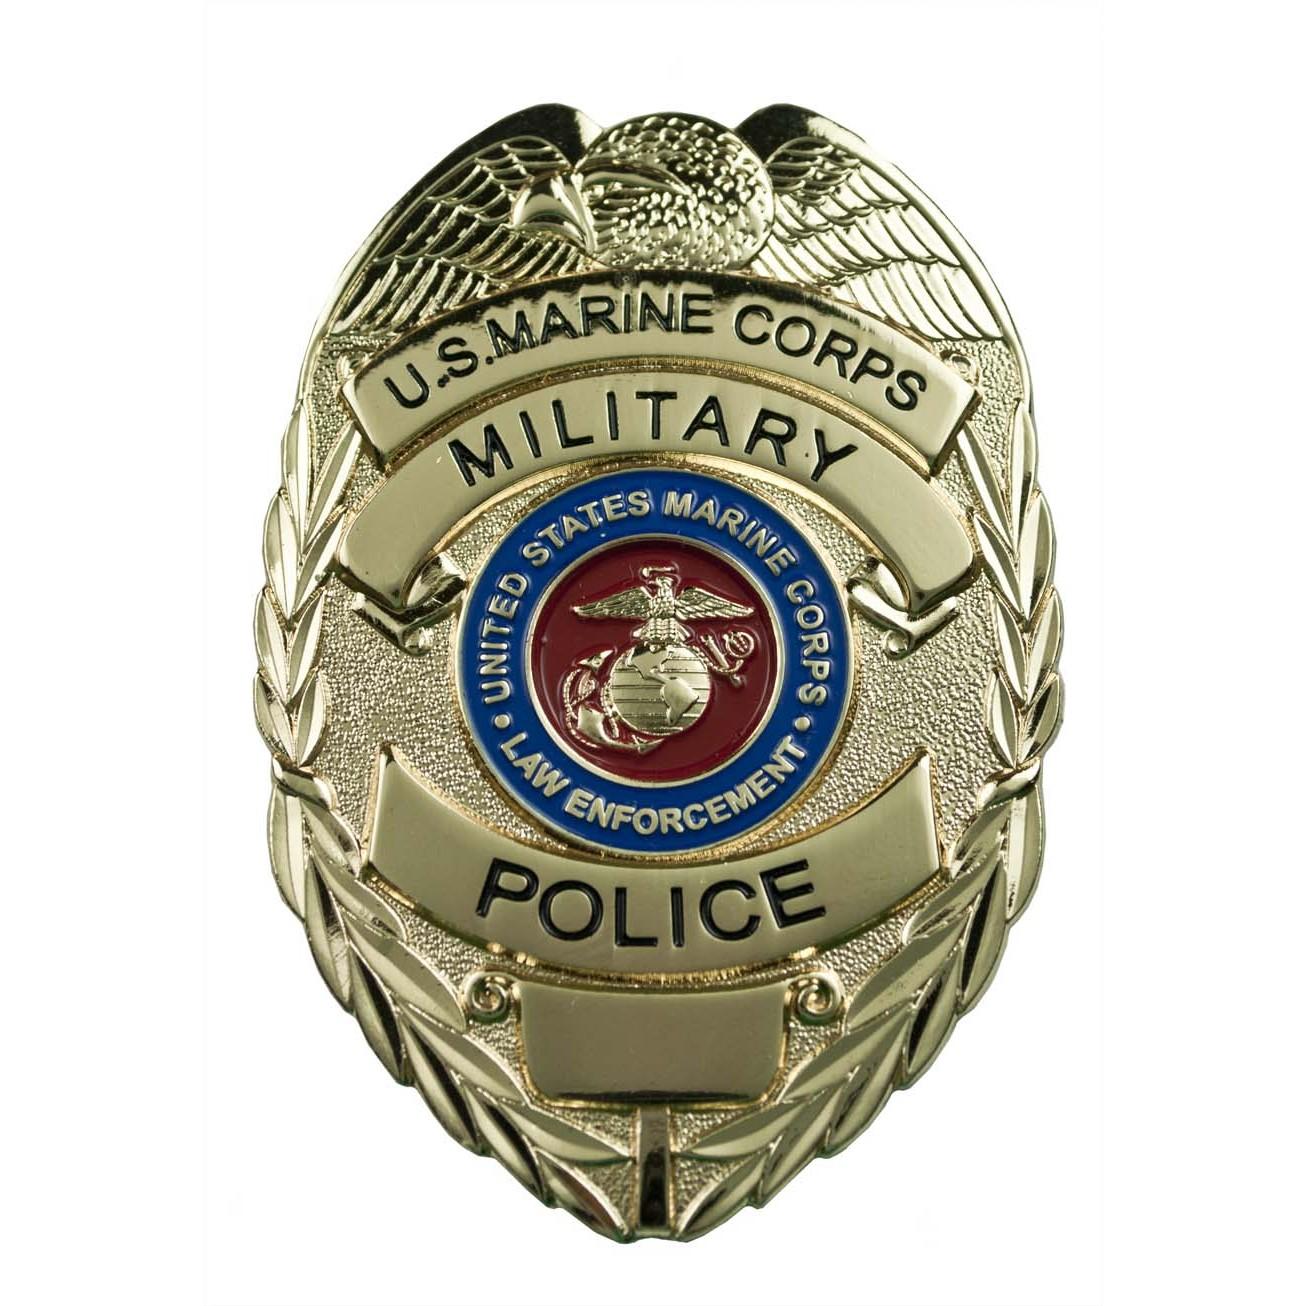 1306x1306 Usmc Military Police Badge Espionage Gadgets Usmc